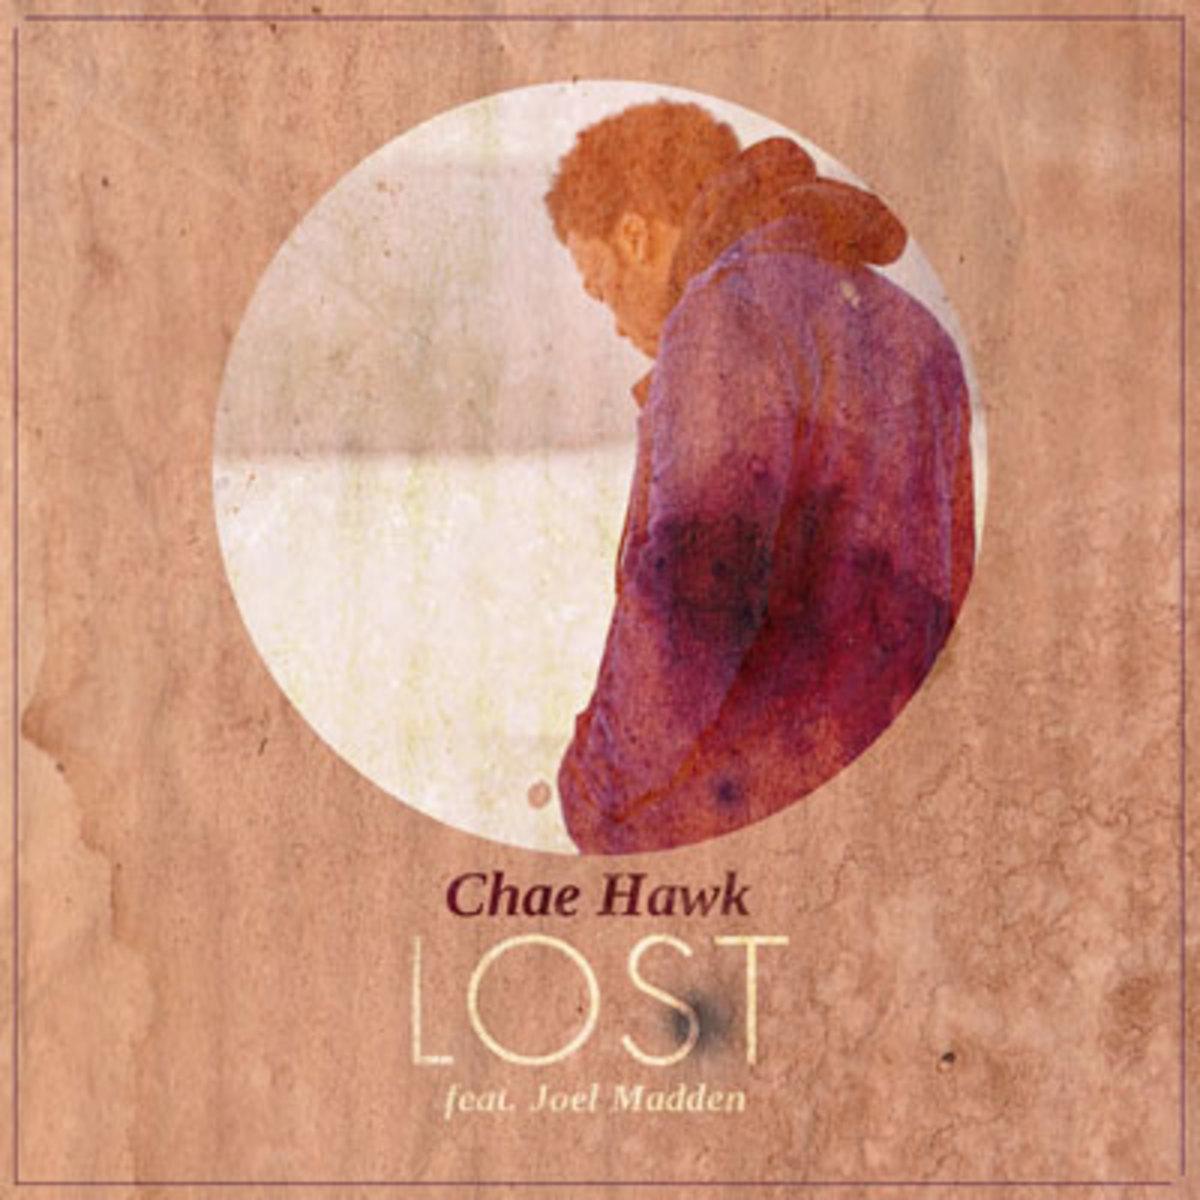 chaehawk-lost.jpg